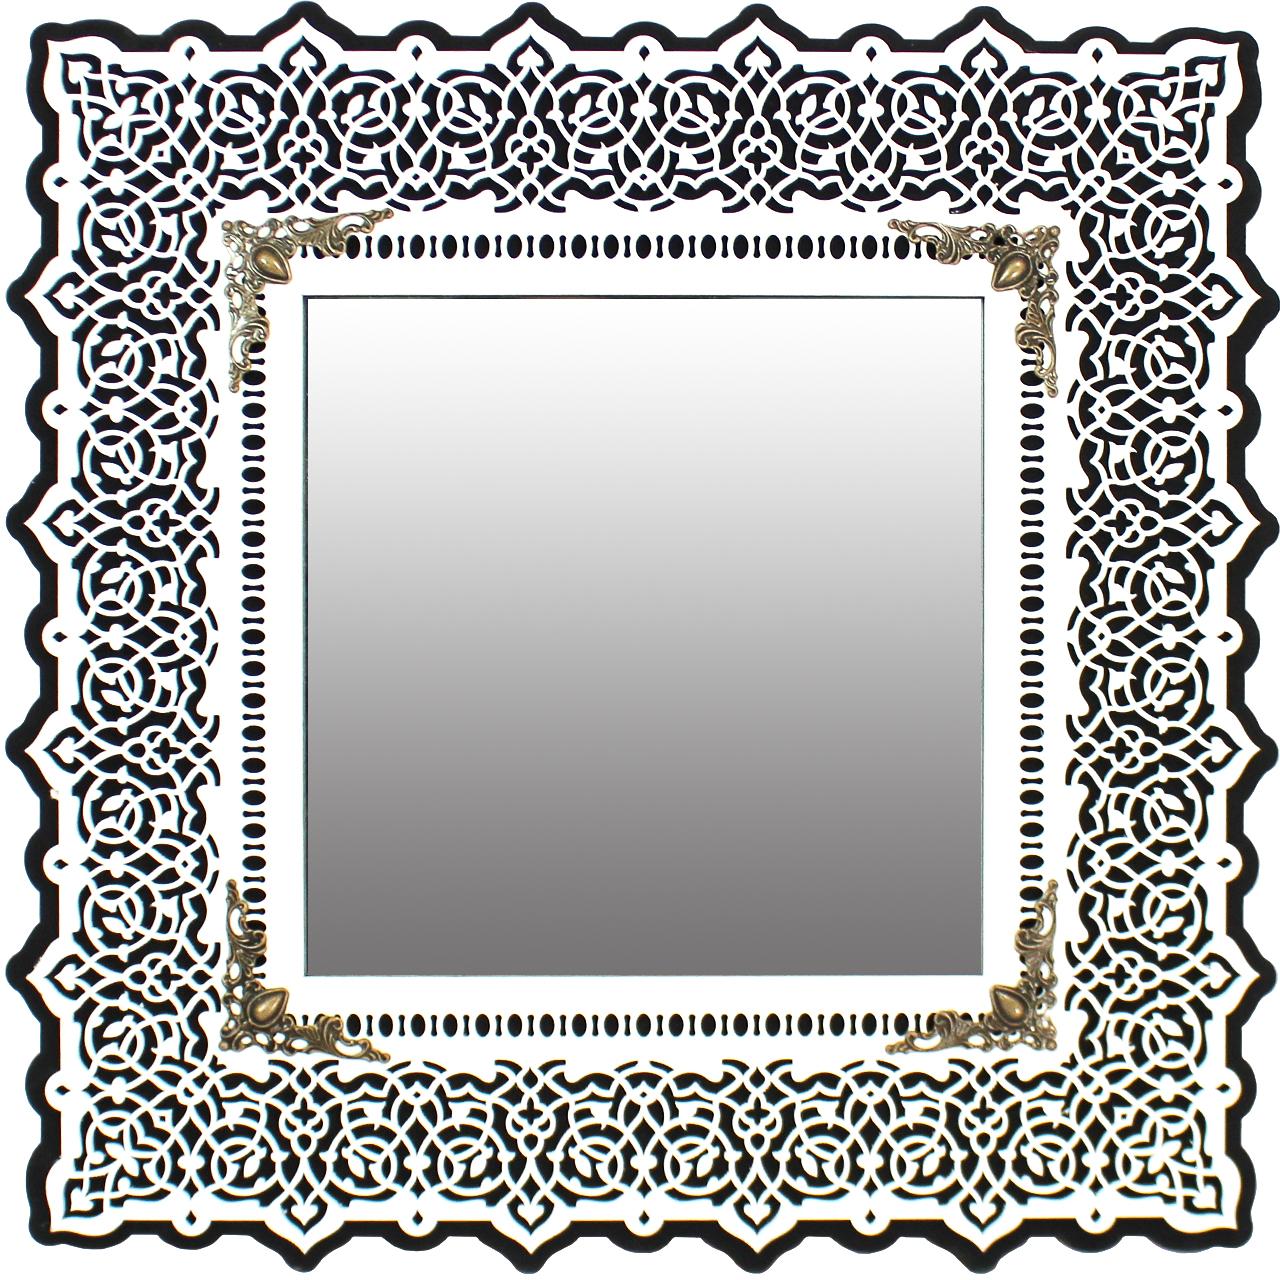 آینه دست نگار کد 02-31